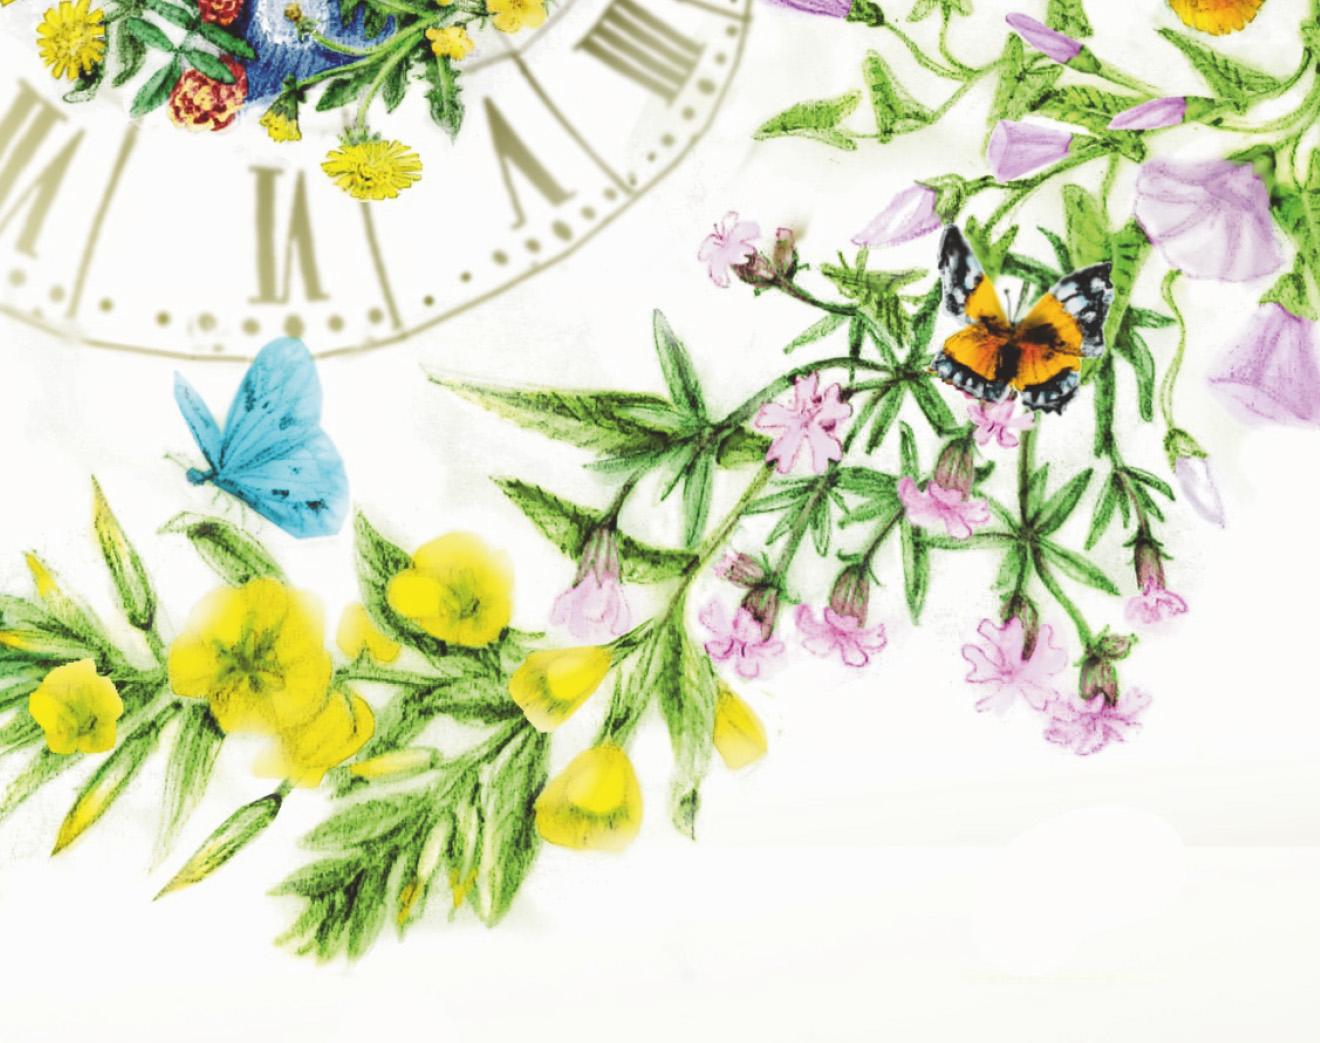 horloge-de-linne-detail